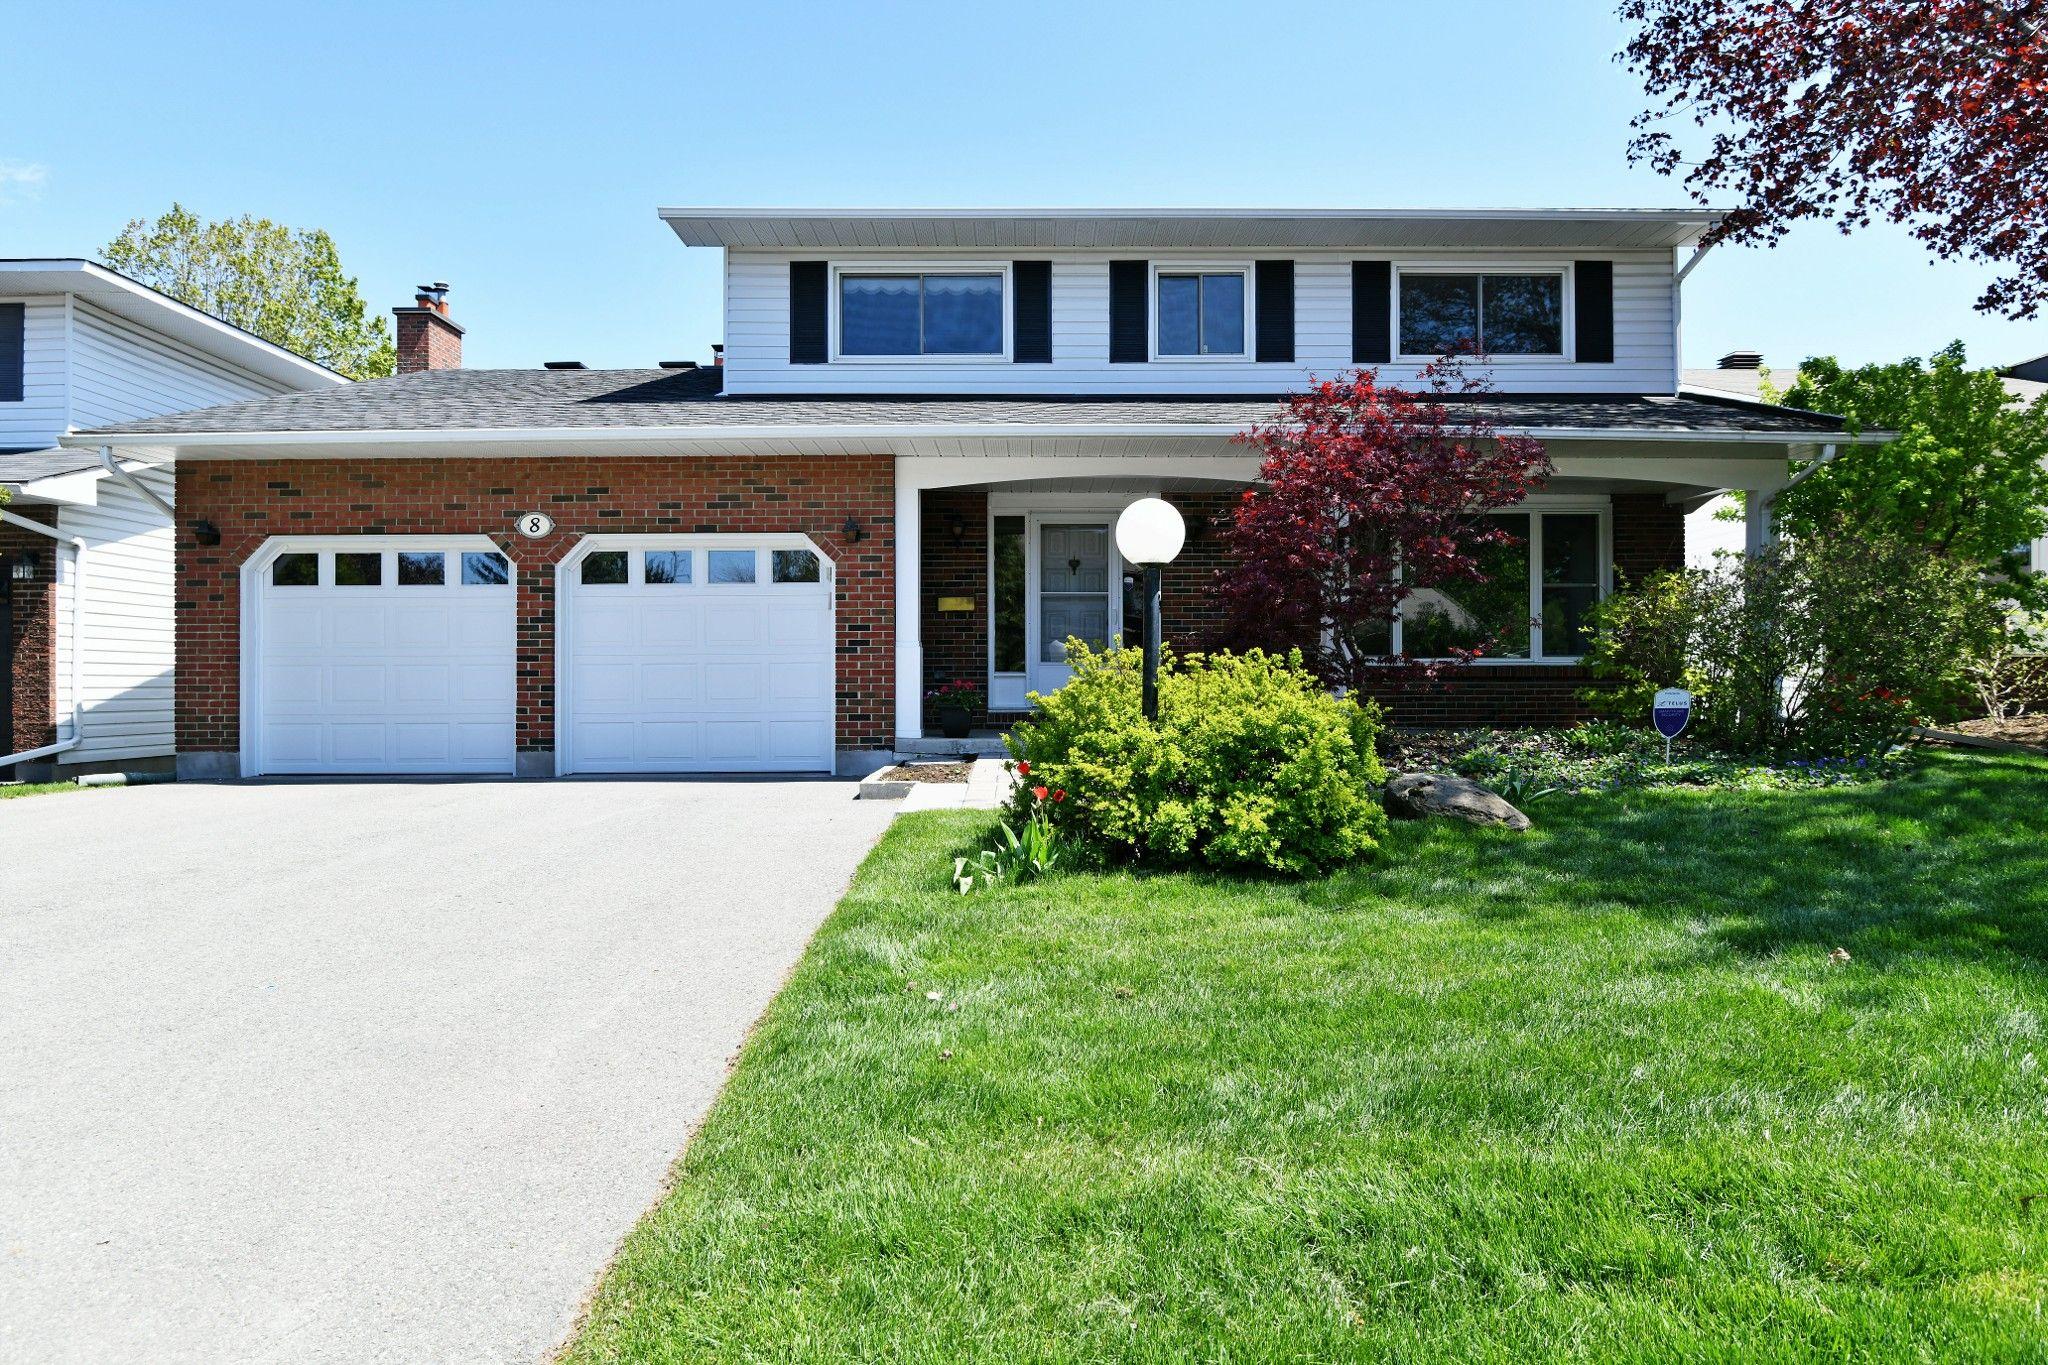 Main Photo: 8 Falk Avenue in Ottawa: Barrhaven House for sale